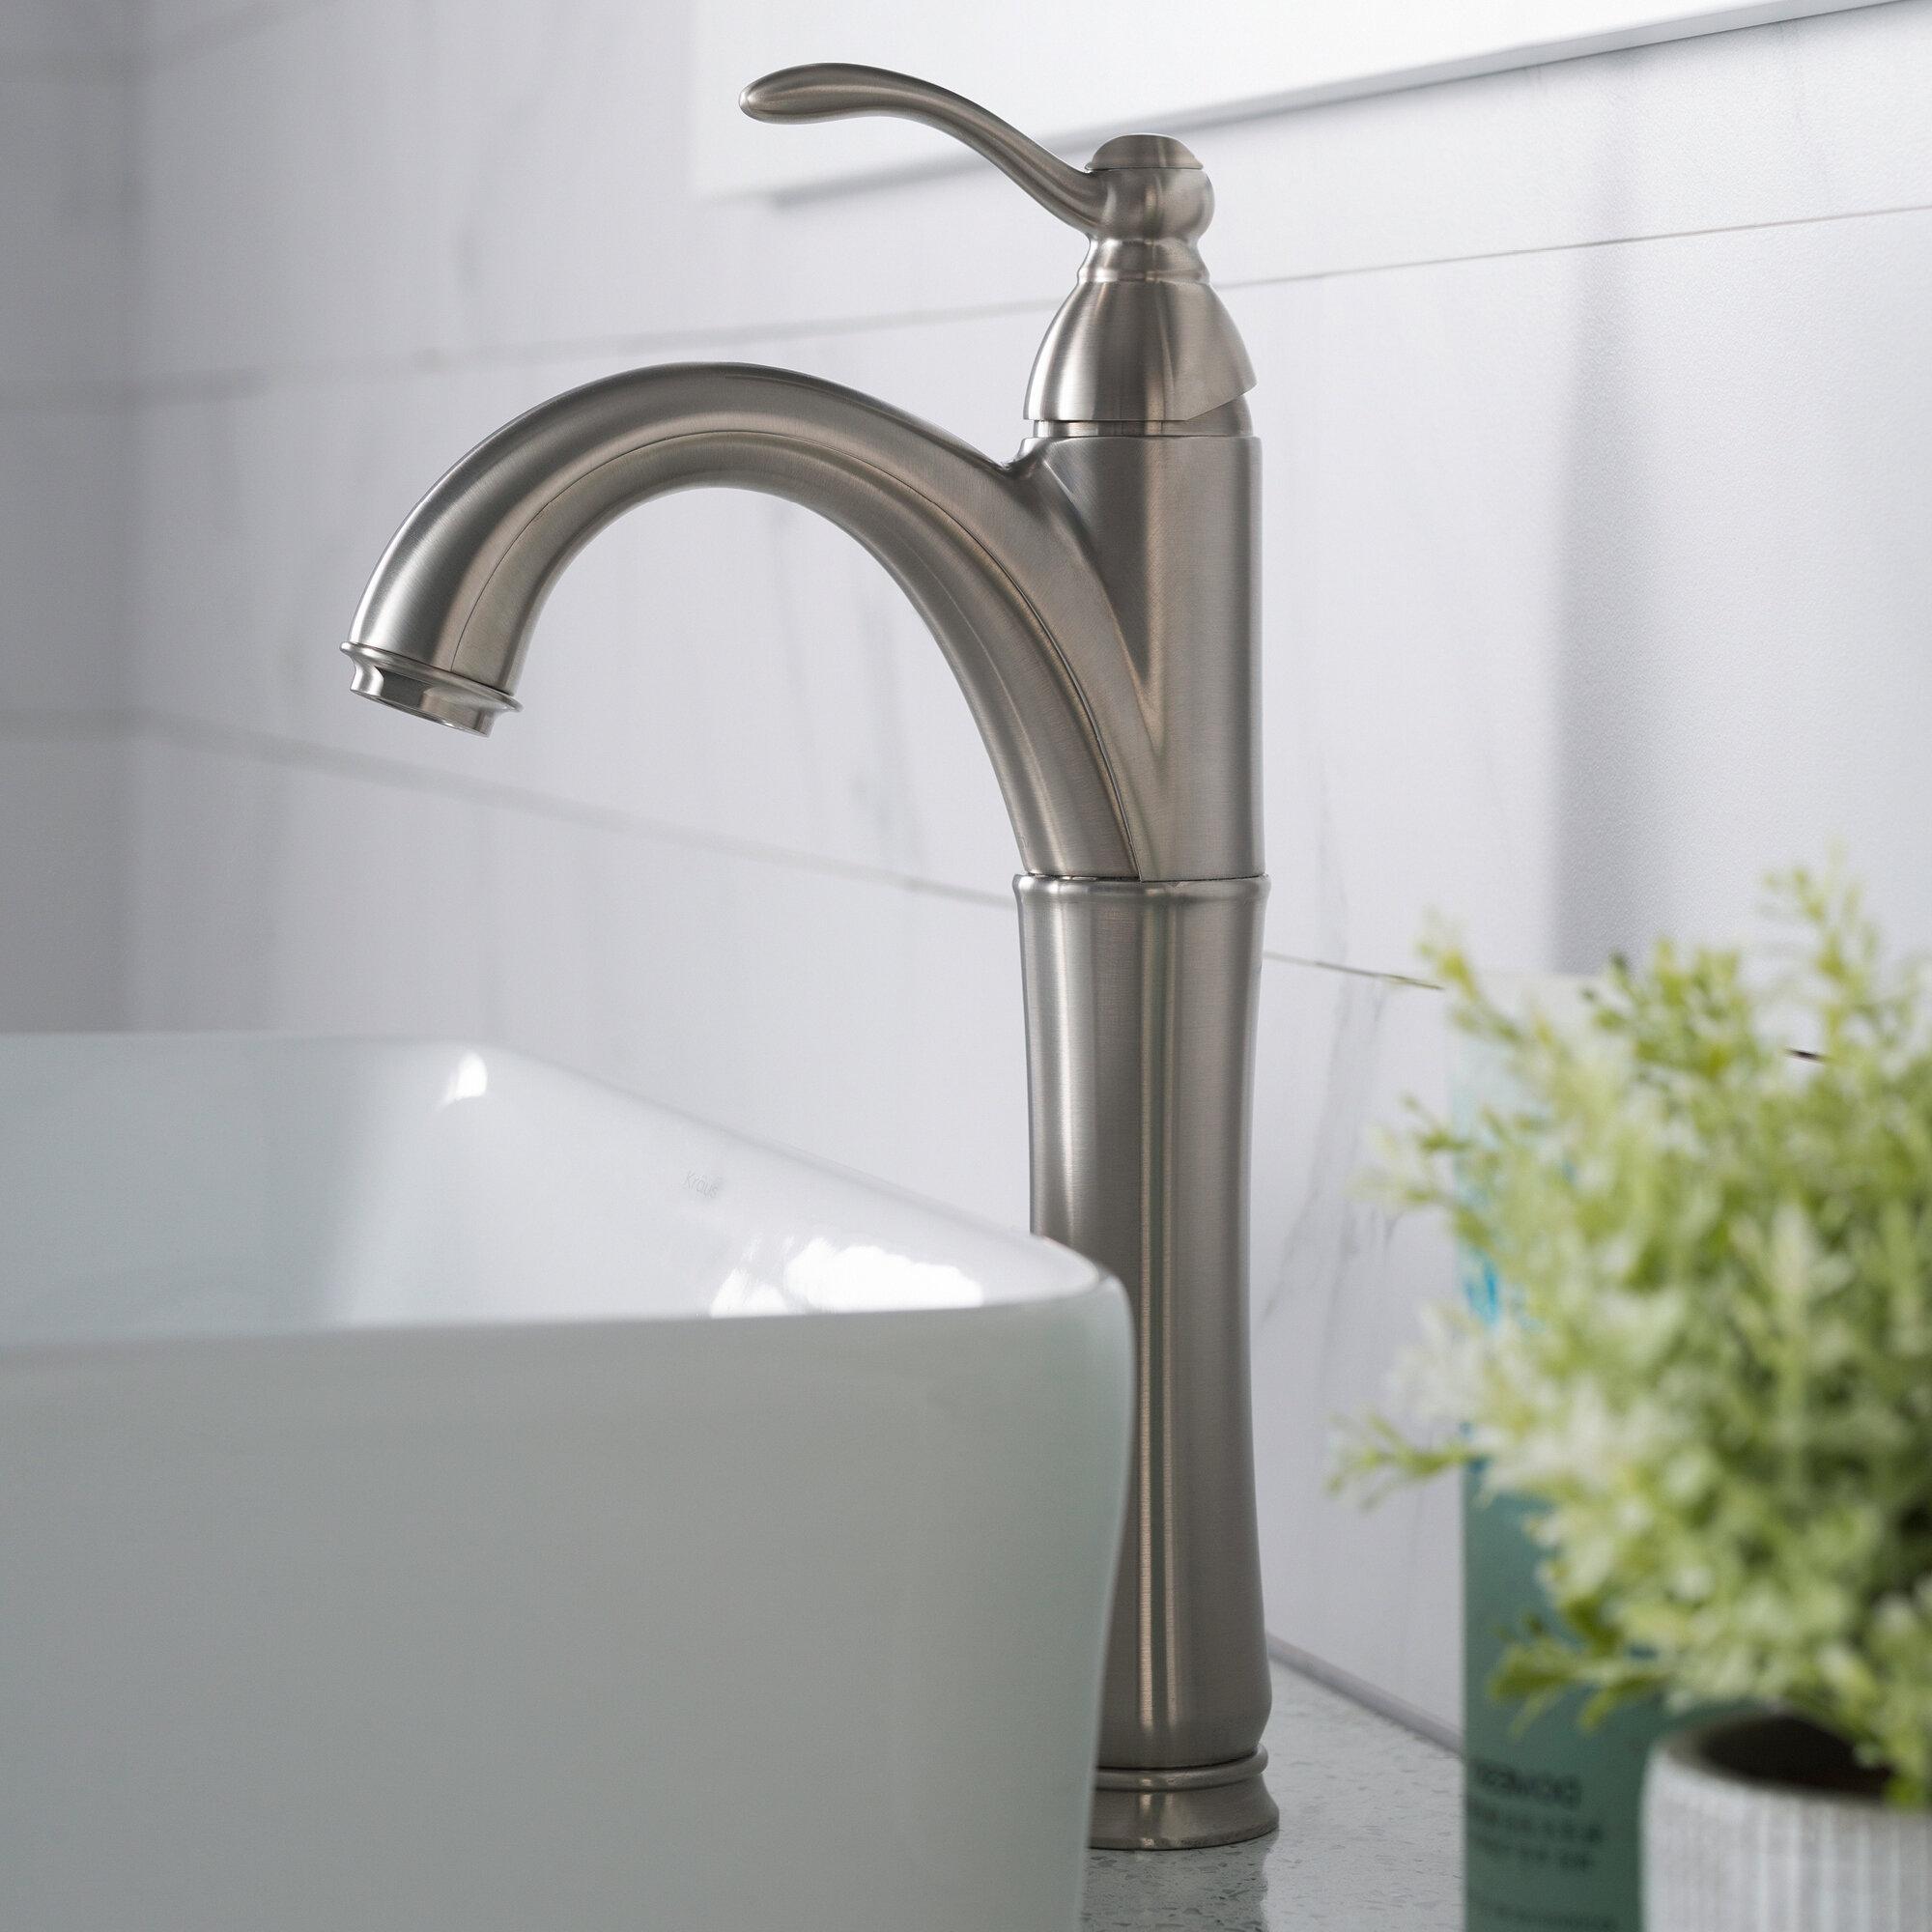 FVS-1005-PU-10ORB,PU-10SN,PU-10CH Kraus Vessel Mixer Single Hole Bathroom Faucet with Optional Pop Up Drain & Reviews | Wayfair